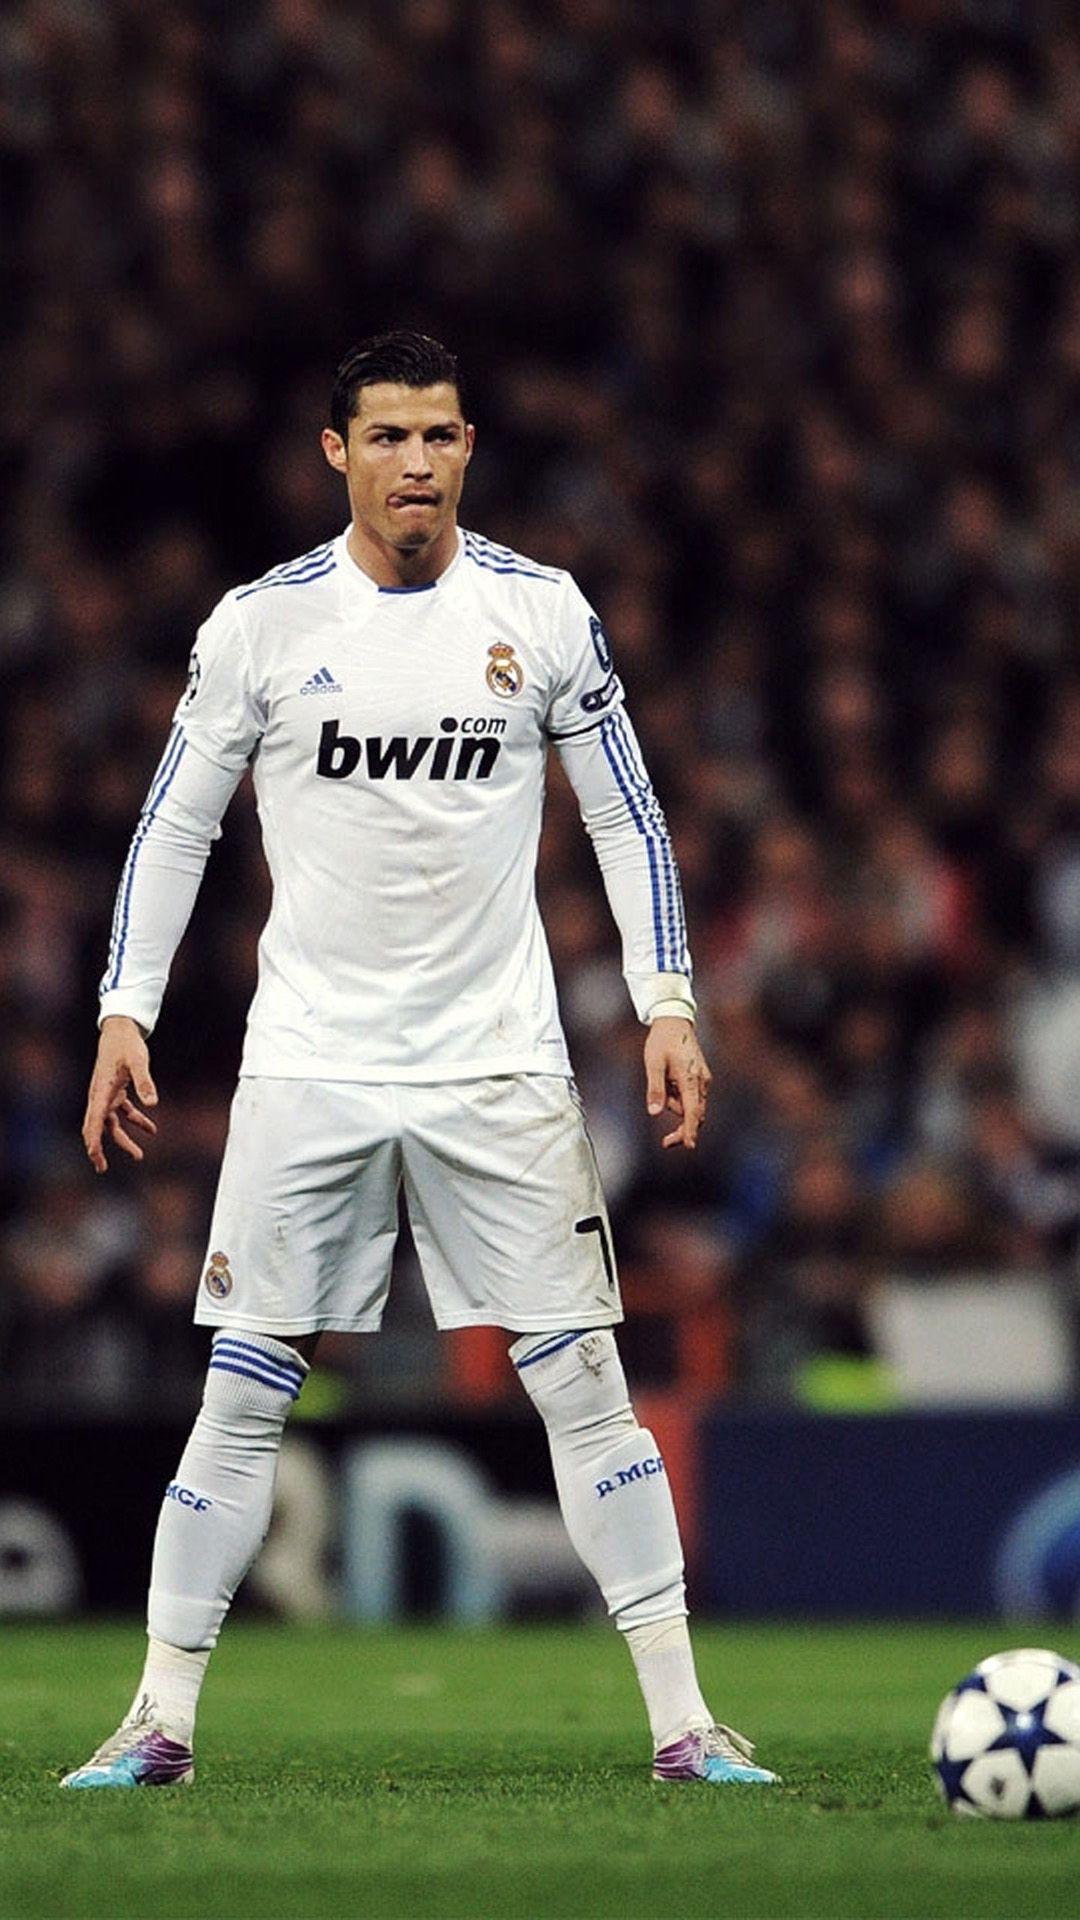 Football Kicking Wallpaper Ronaldo